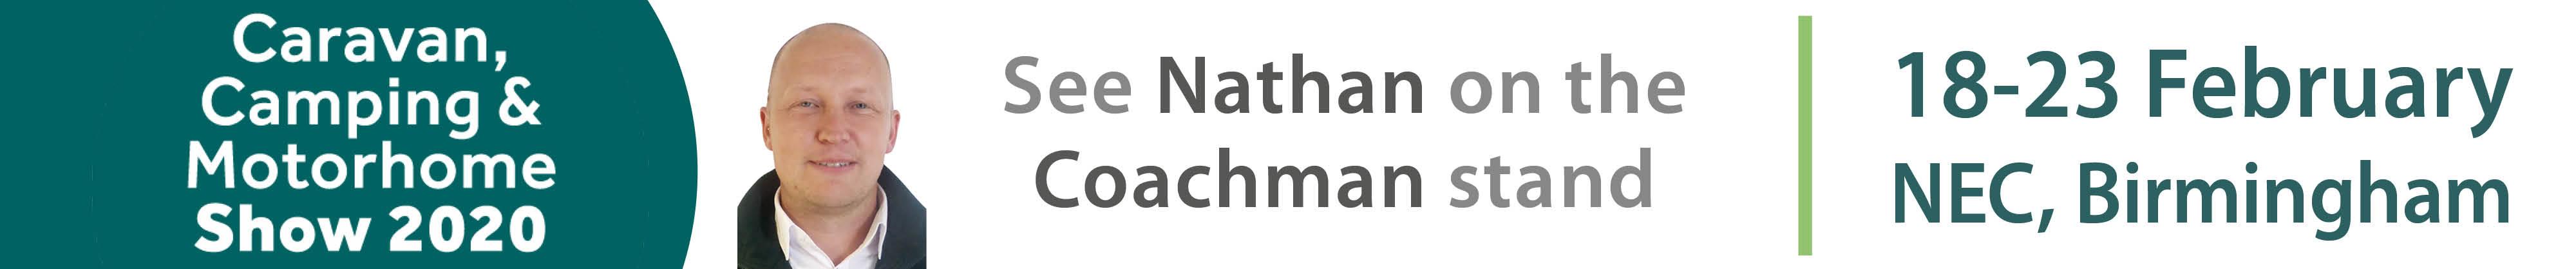 NEC Feb 2020 - Coachman